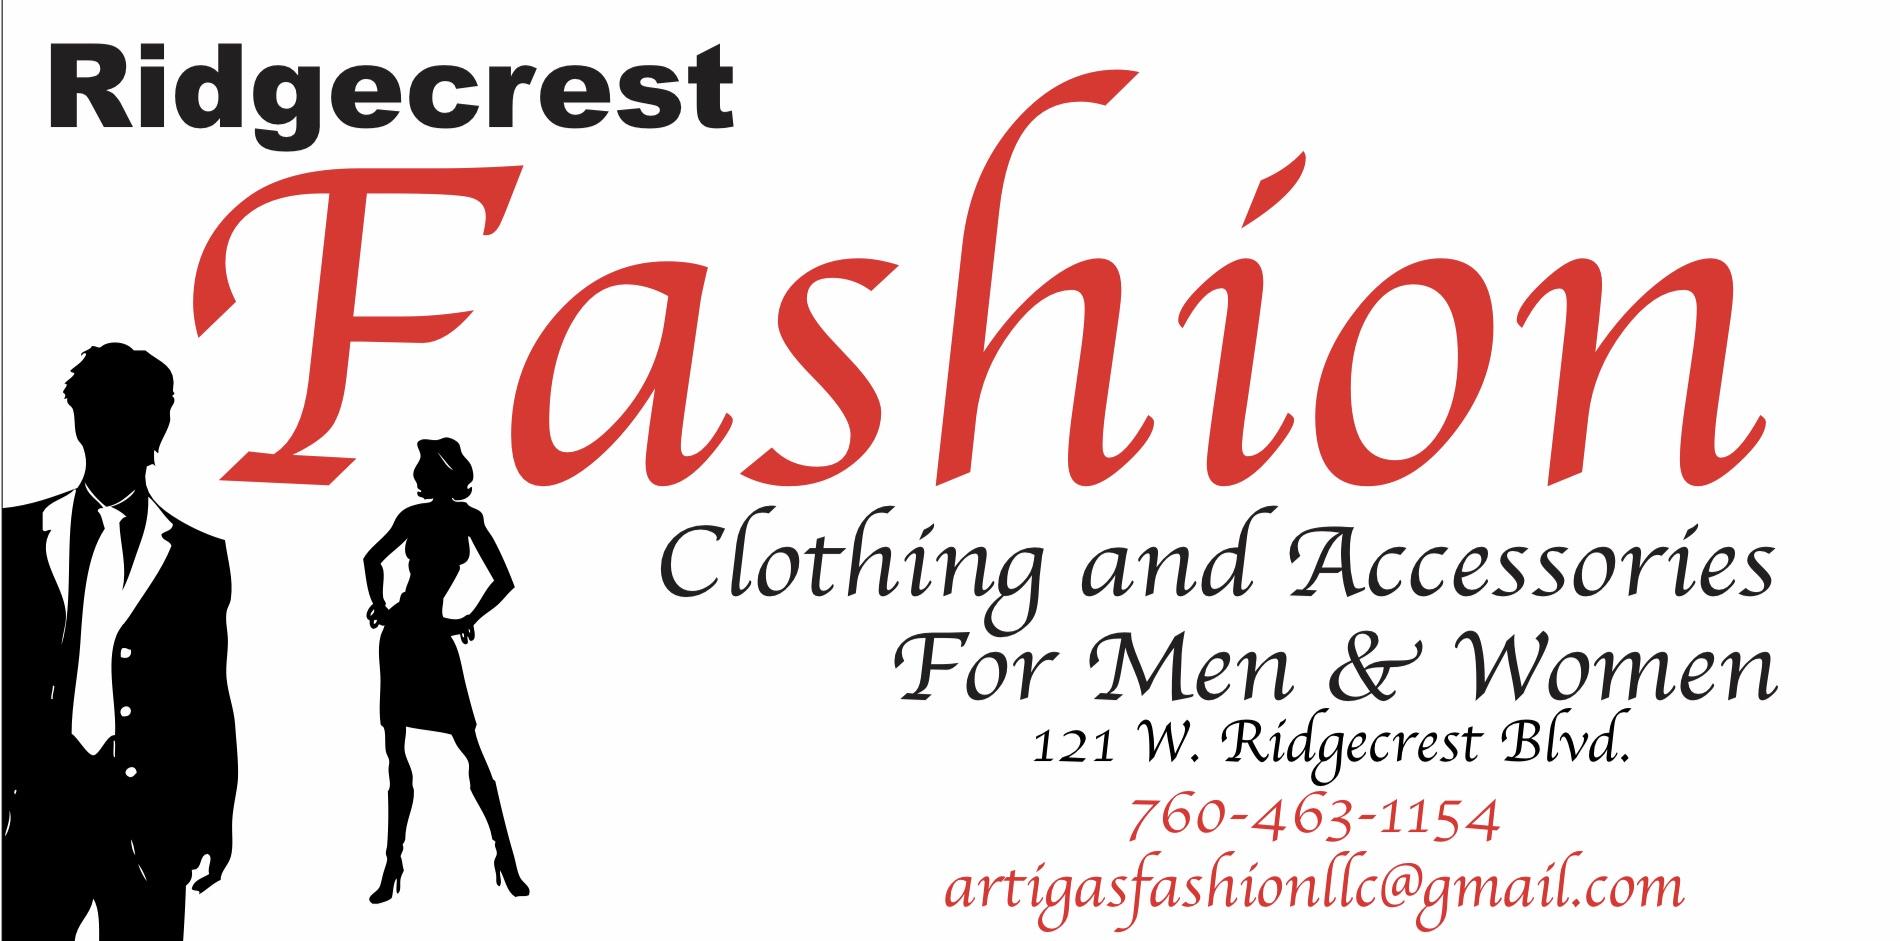 Ridgecrest Fashion